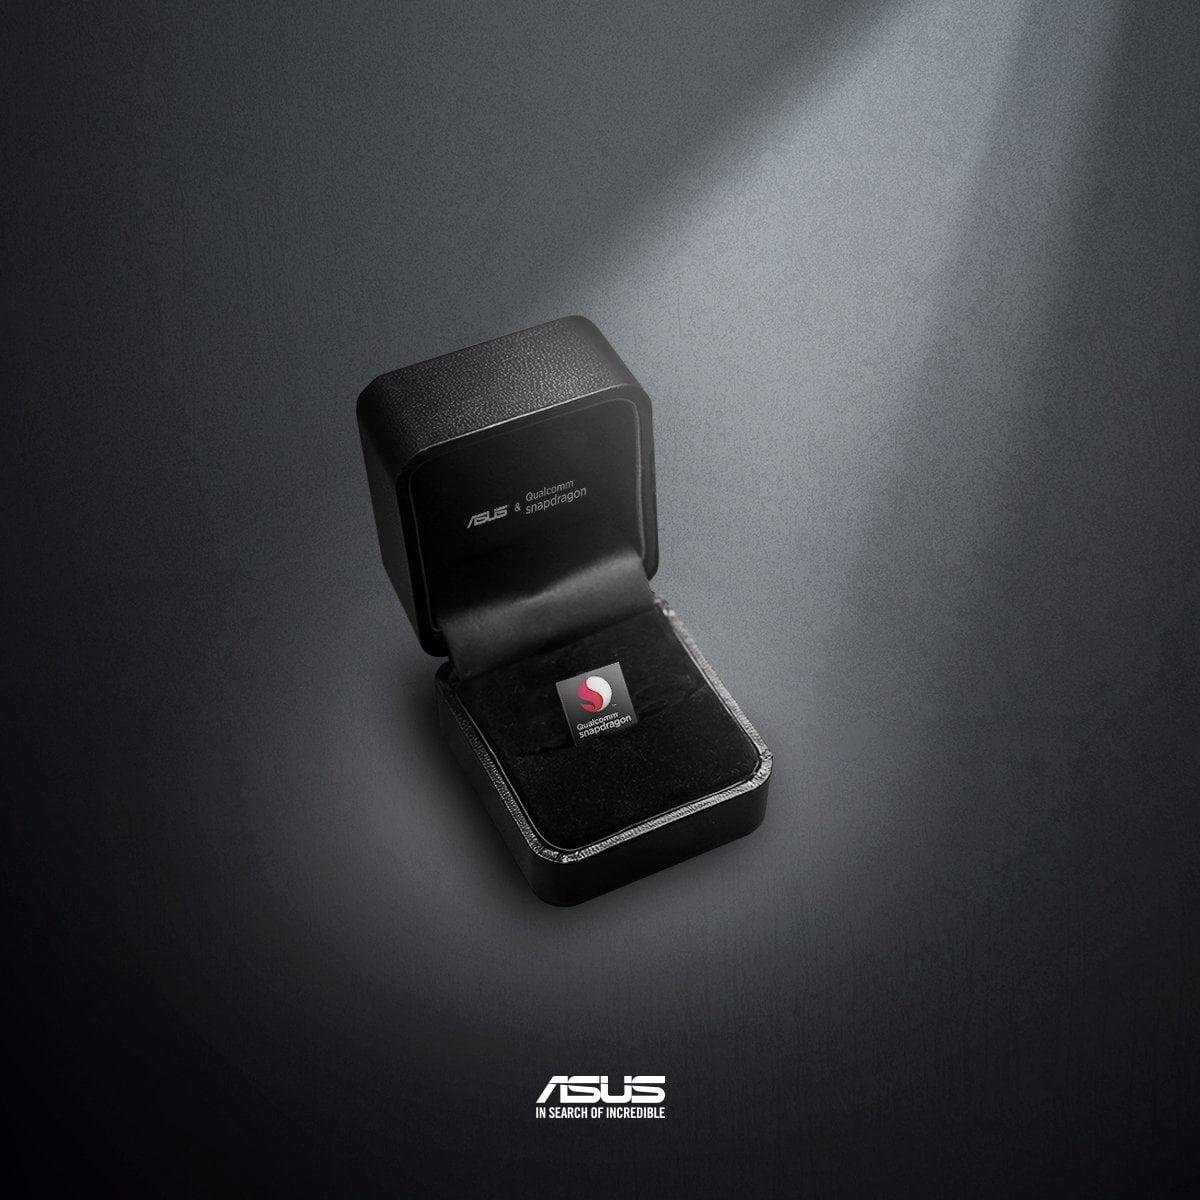 4 stycznia, na CES 2017, Asus zaprezentuje smartfon ze Snapdragonem 835 (aktualizacja) 29